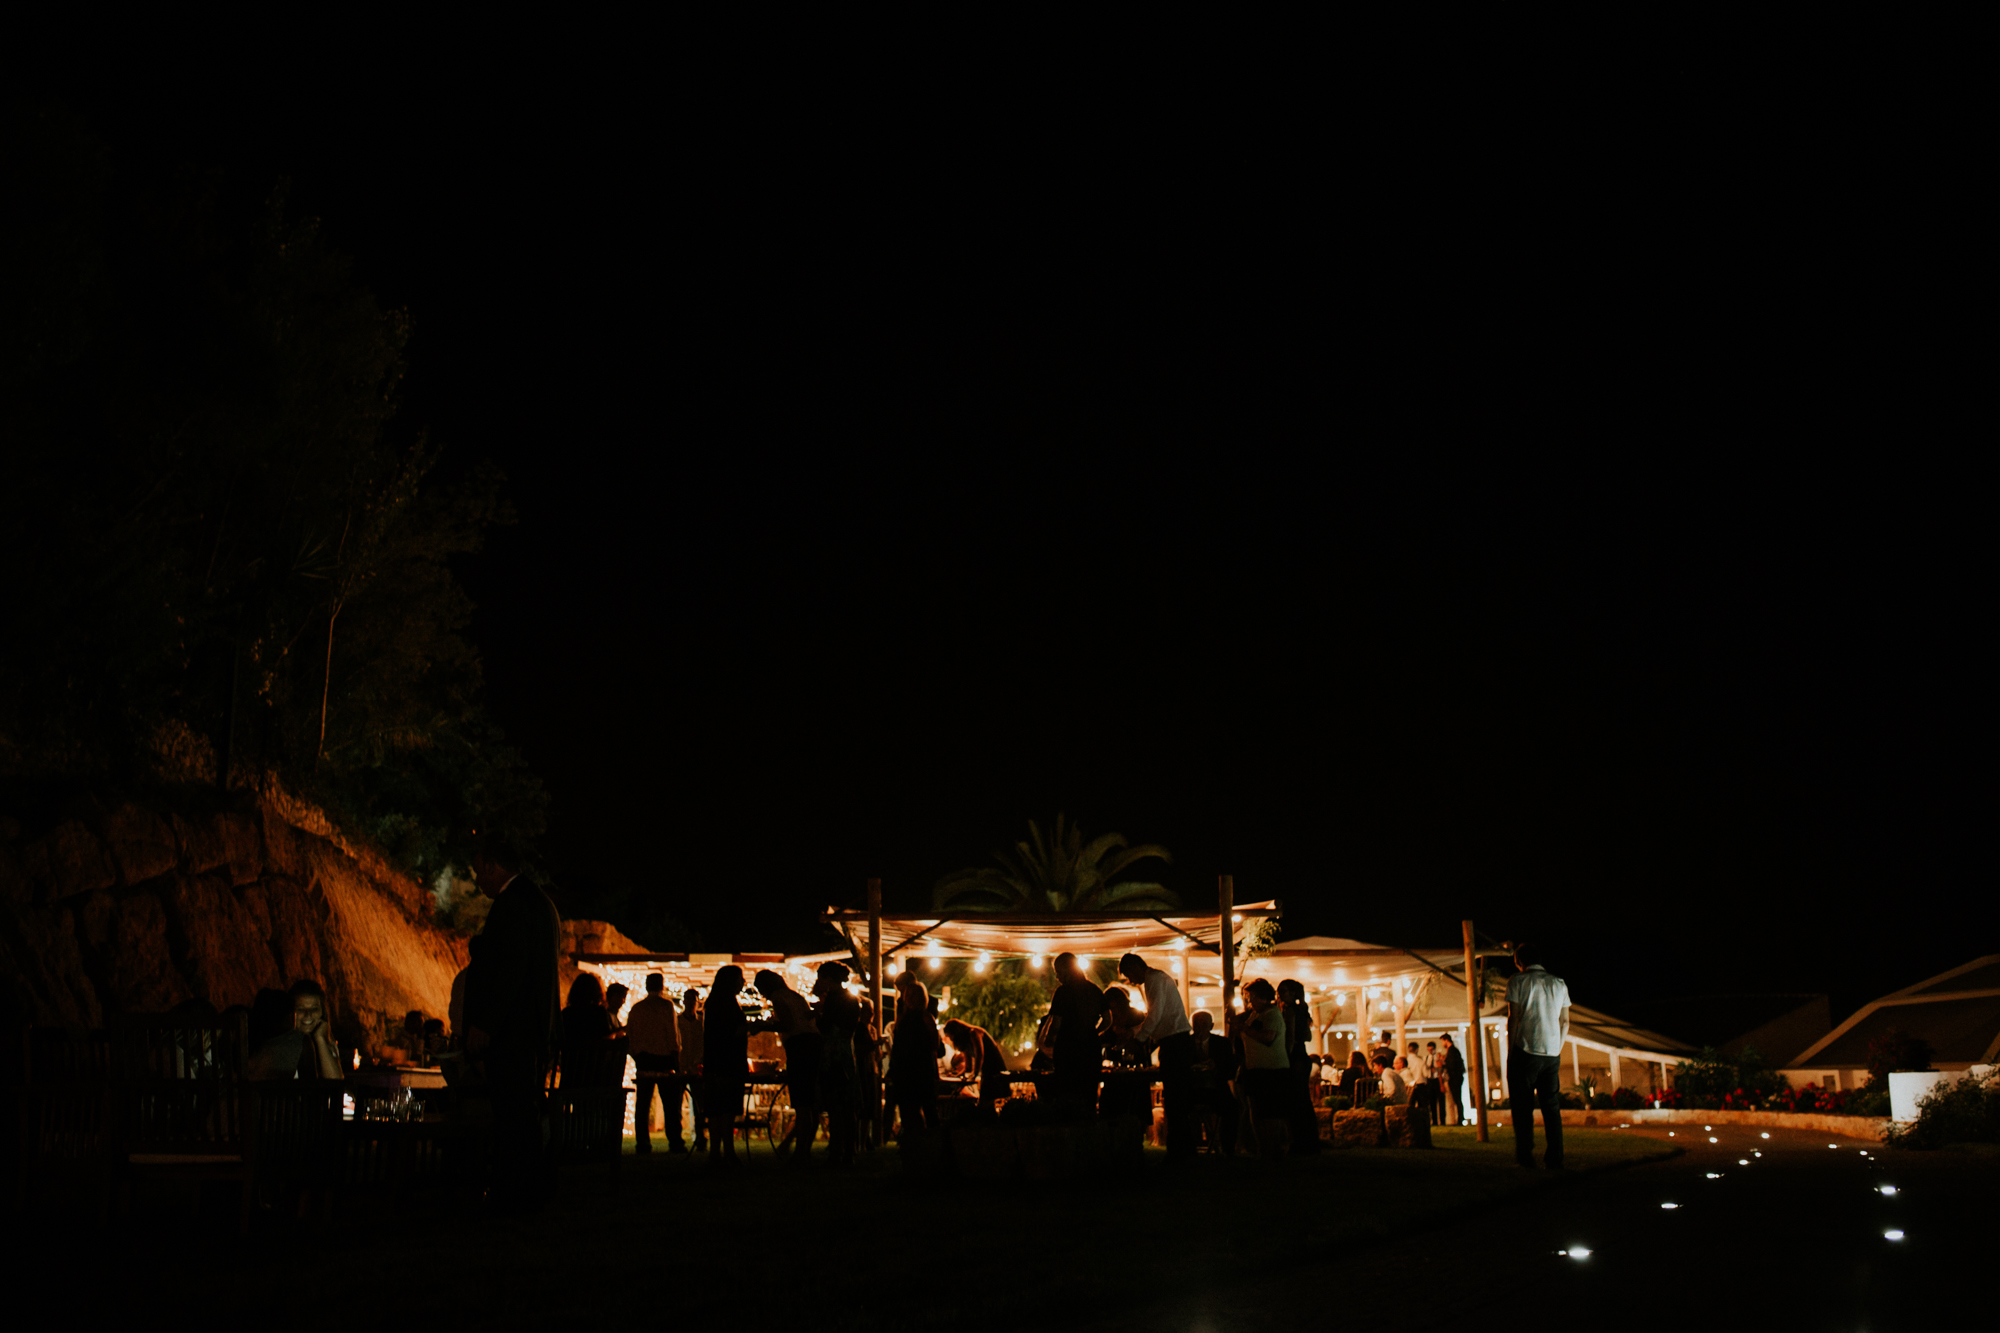 005-carina-e-samuel-wedding-casamento-quinta-dos-rouxinois-rustico-my-fancy-wedding-mafra-malveira-lisboa-sintra-cascais-filipe-santiago-fotografia-fotografo-lifestyle-destination-portugal